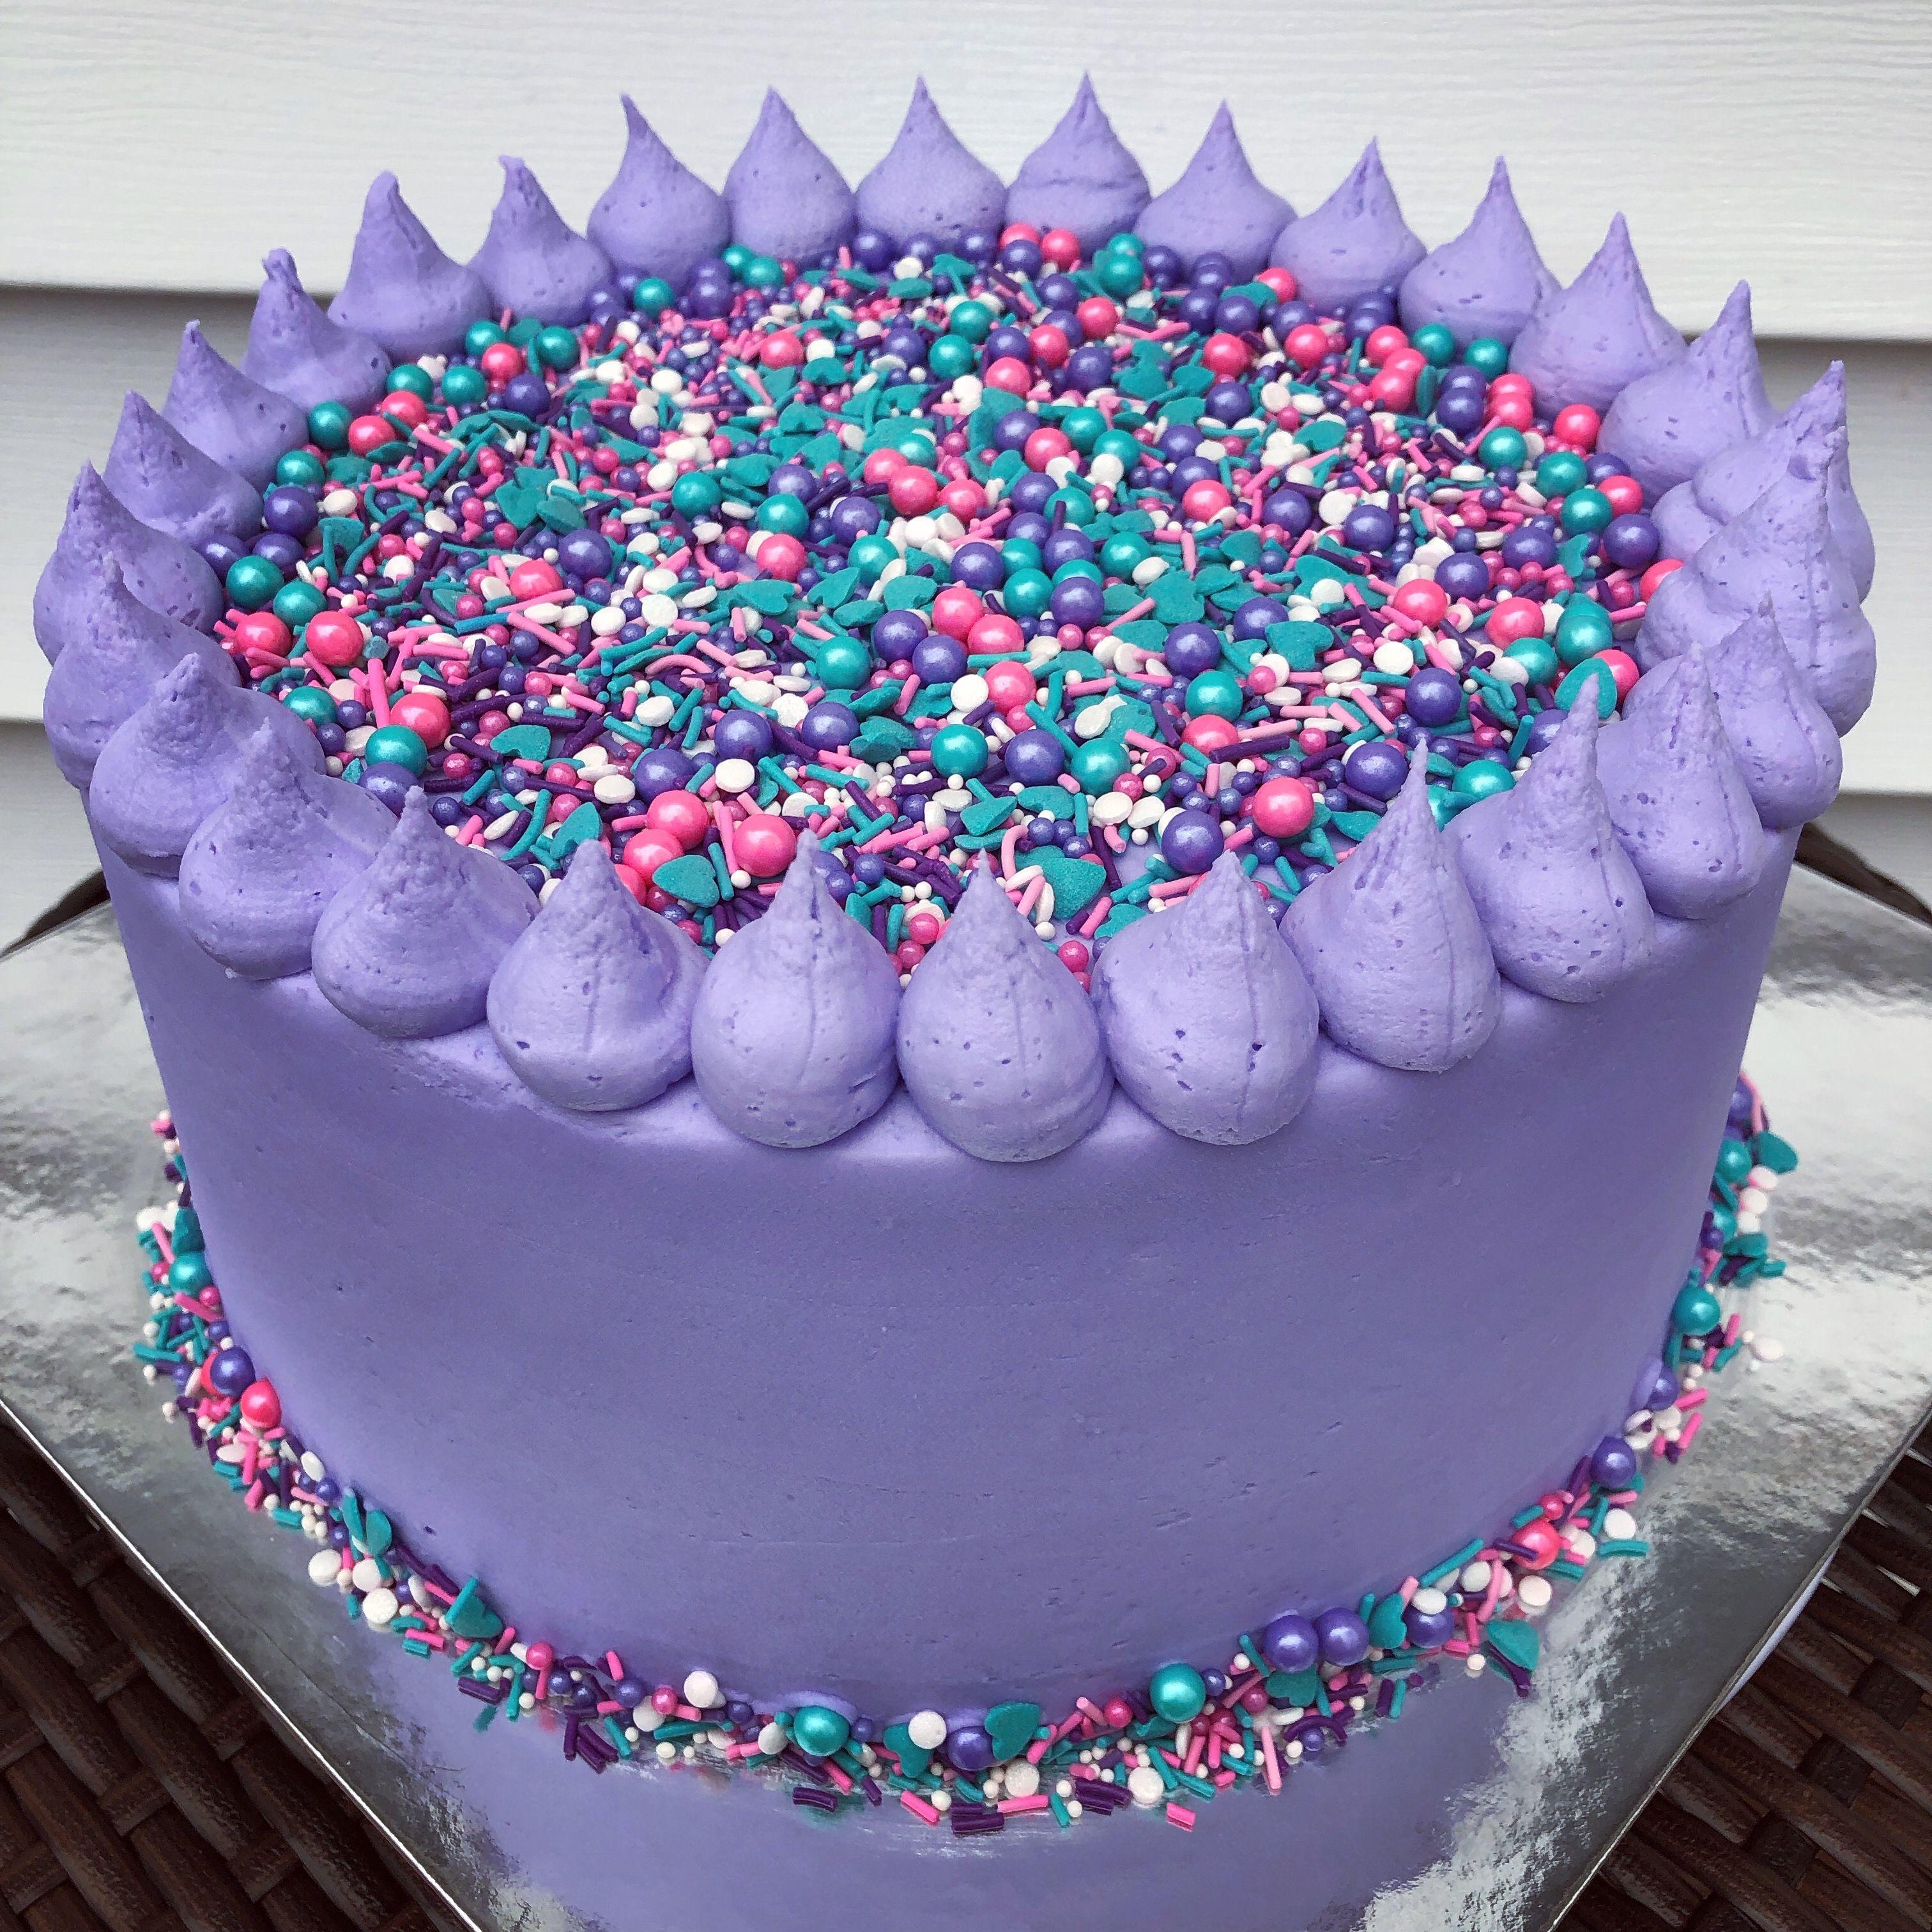 purple sprinkles// fudge //cupcakes// cakepops// fairybread//cake decorating//biscuits